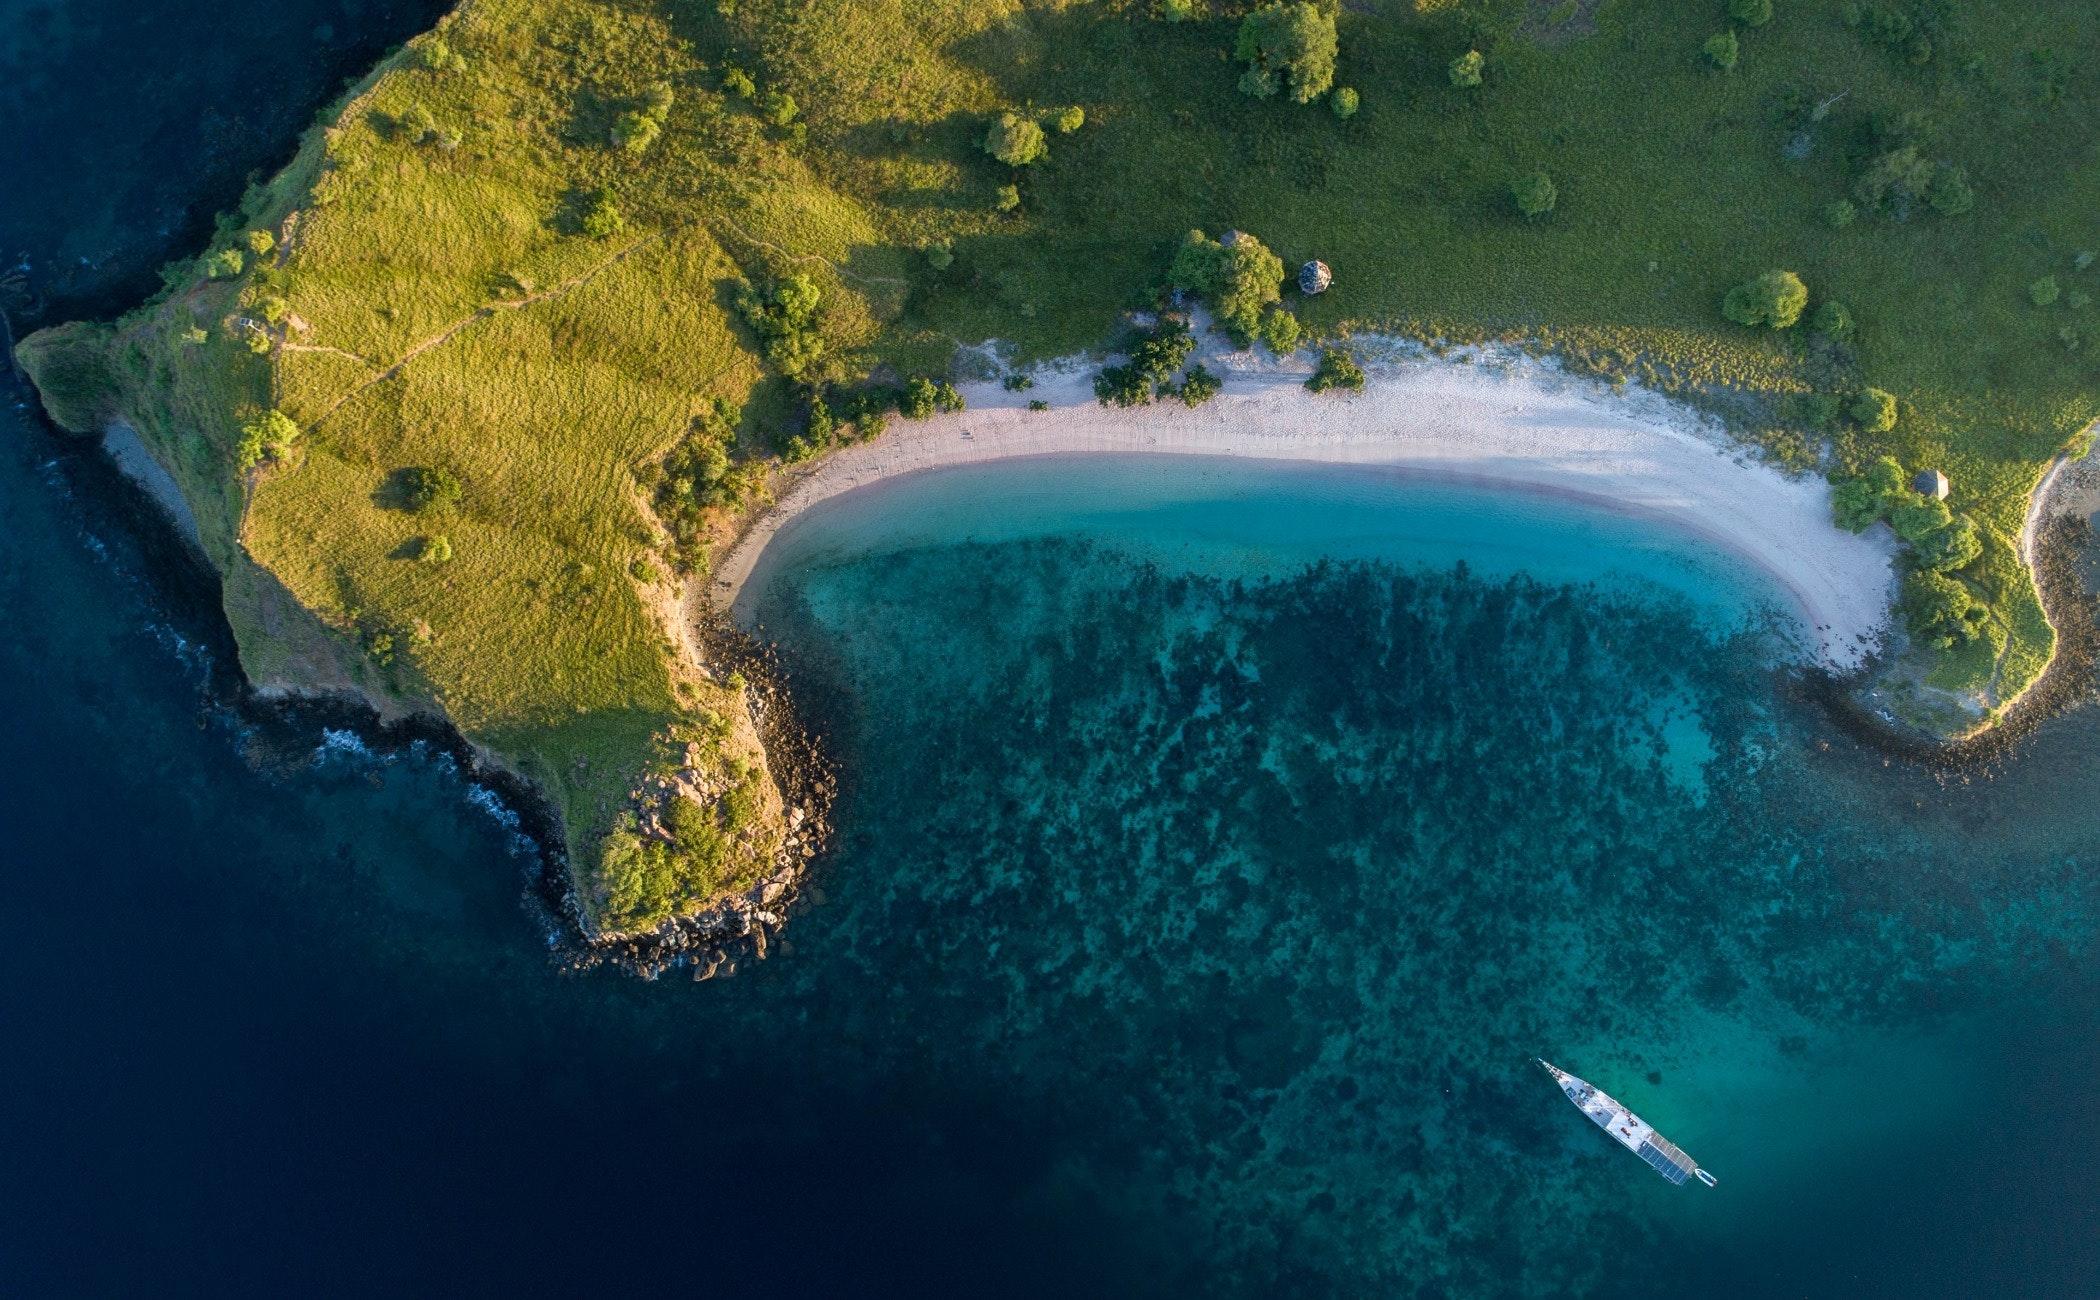 nature,outdoors,land,water,sea,shoreline,coast,beach,landscape,scenery